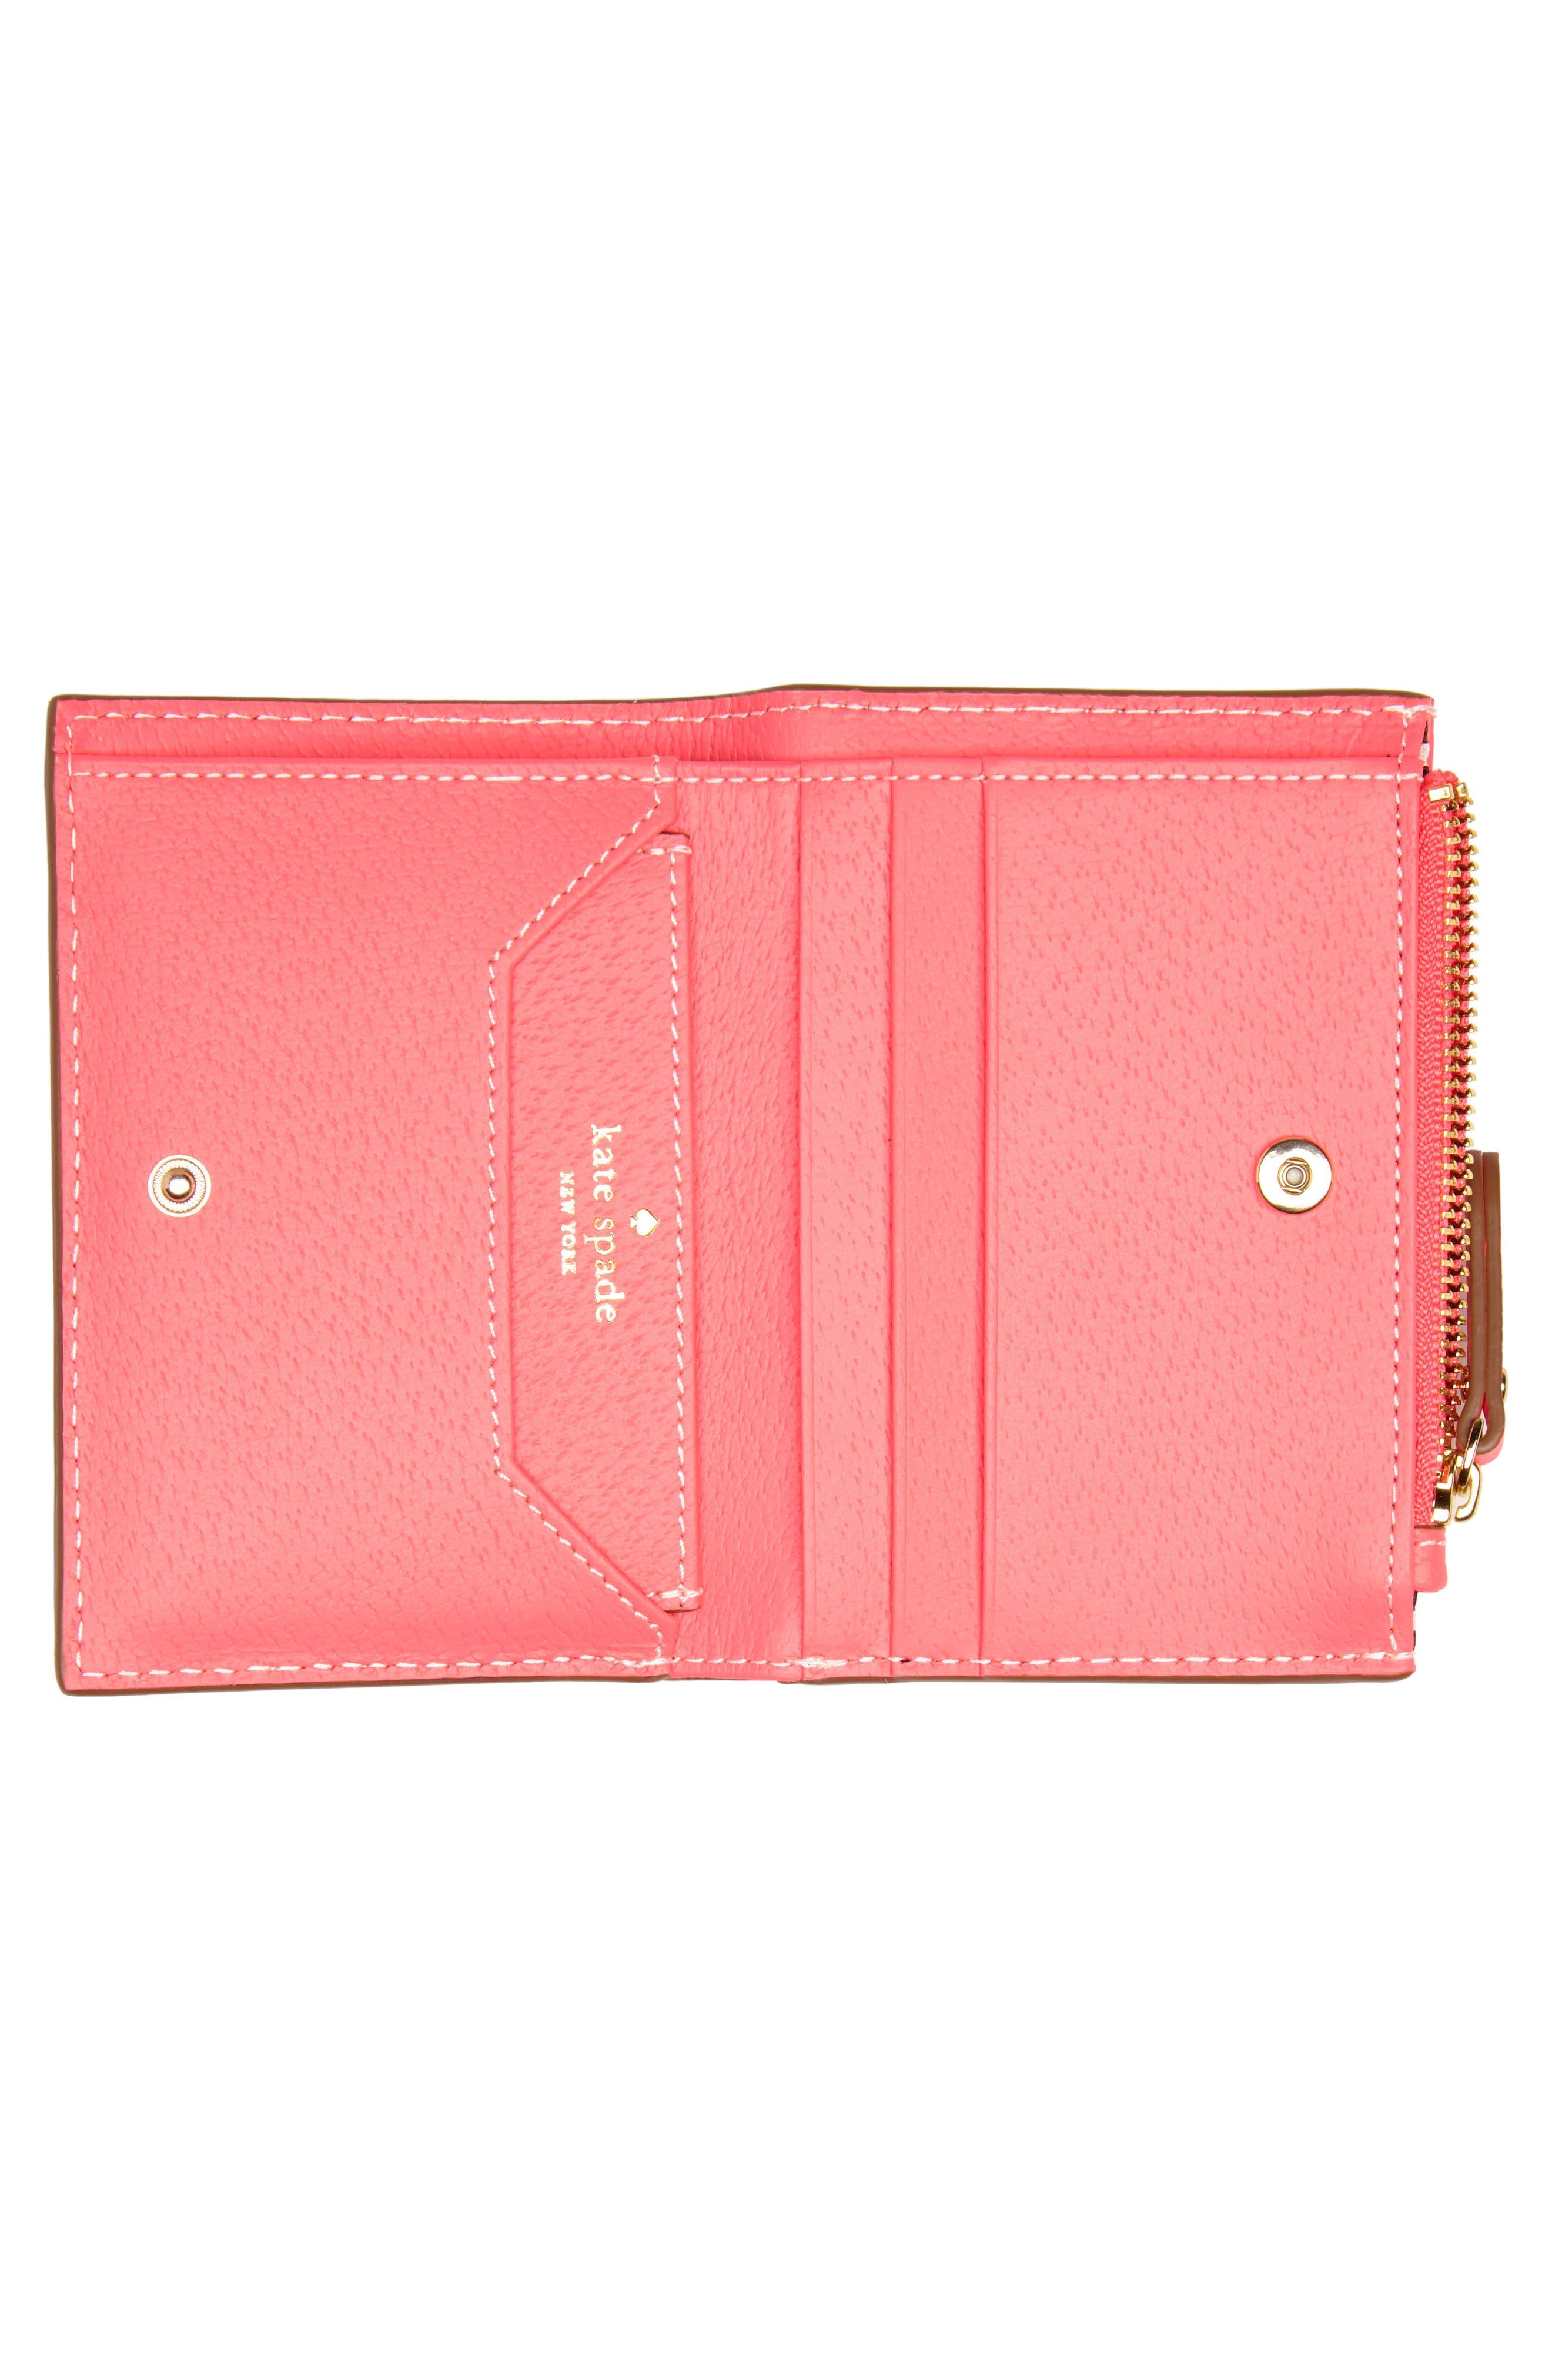 thompson street – abri leather wallet,                             Alternate thumbnail 2, color,                             Bright Flamingo